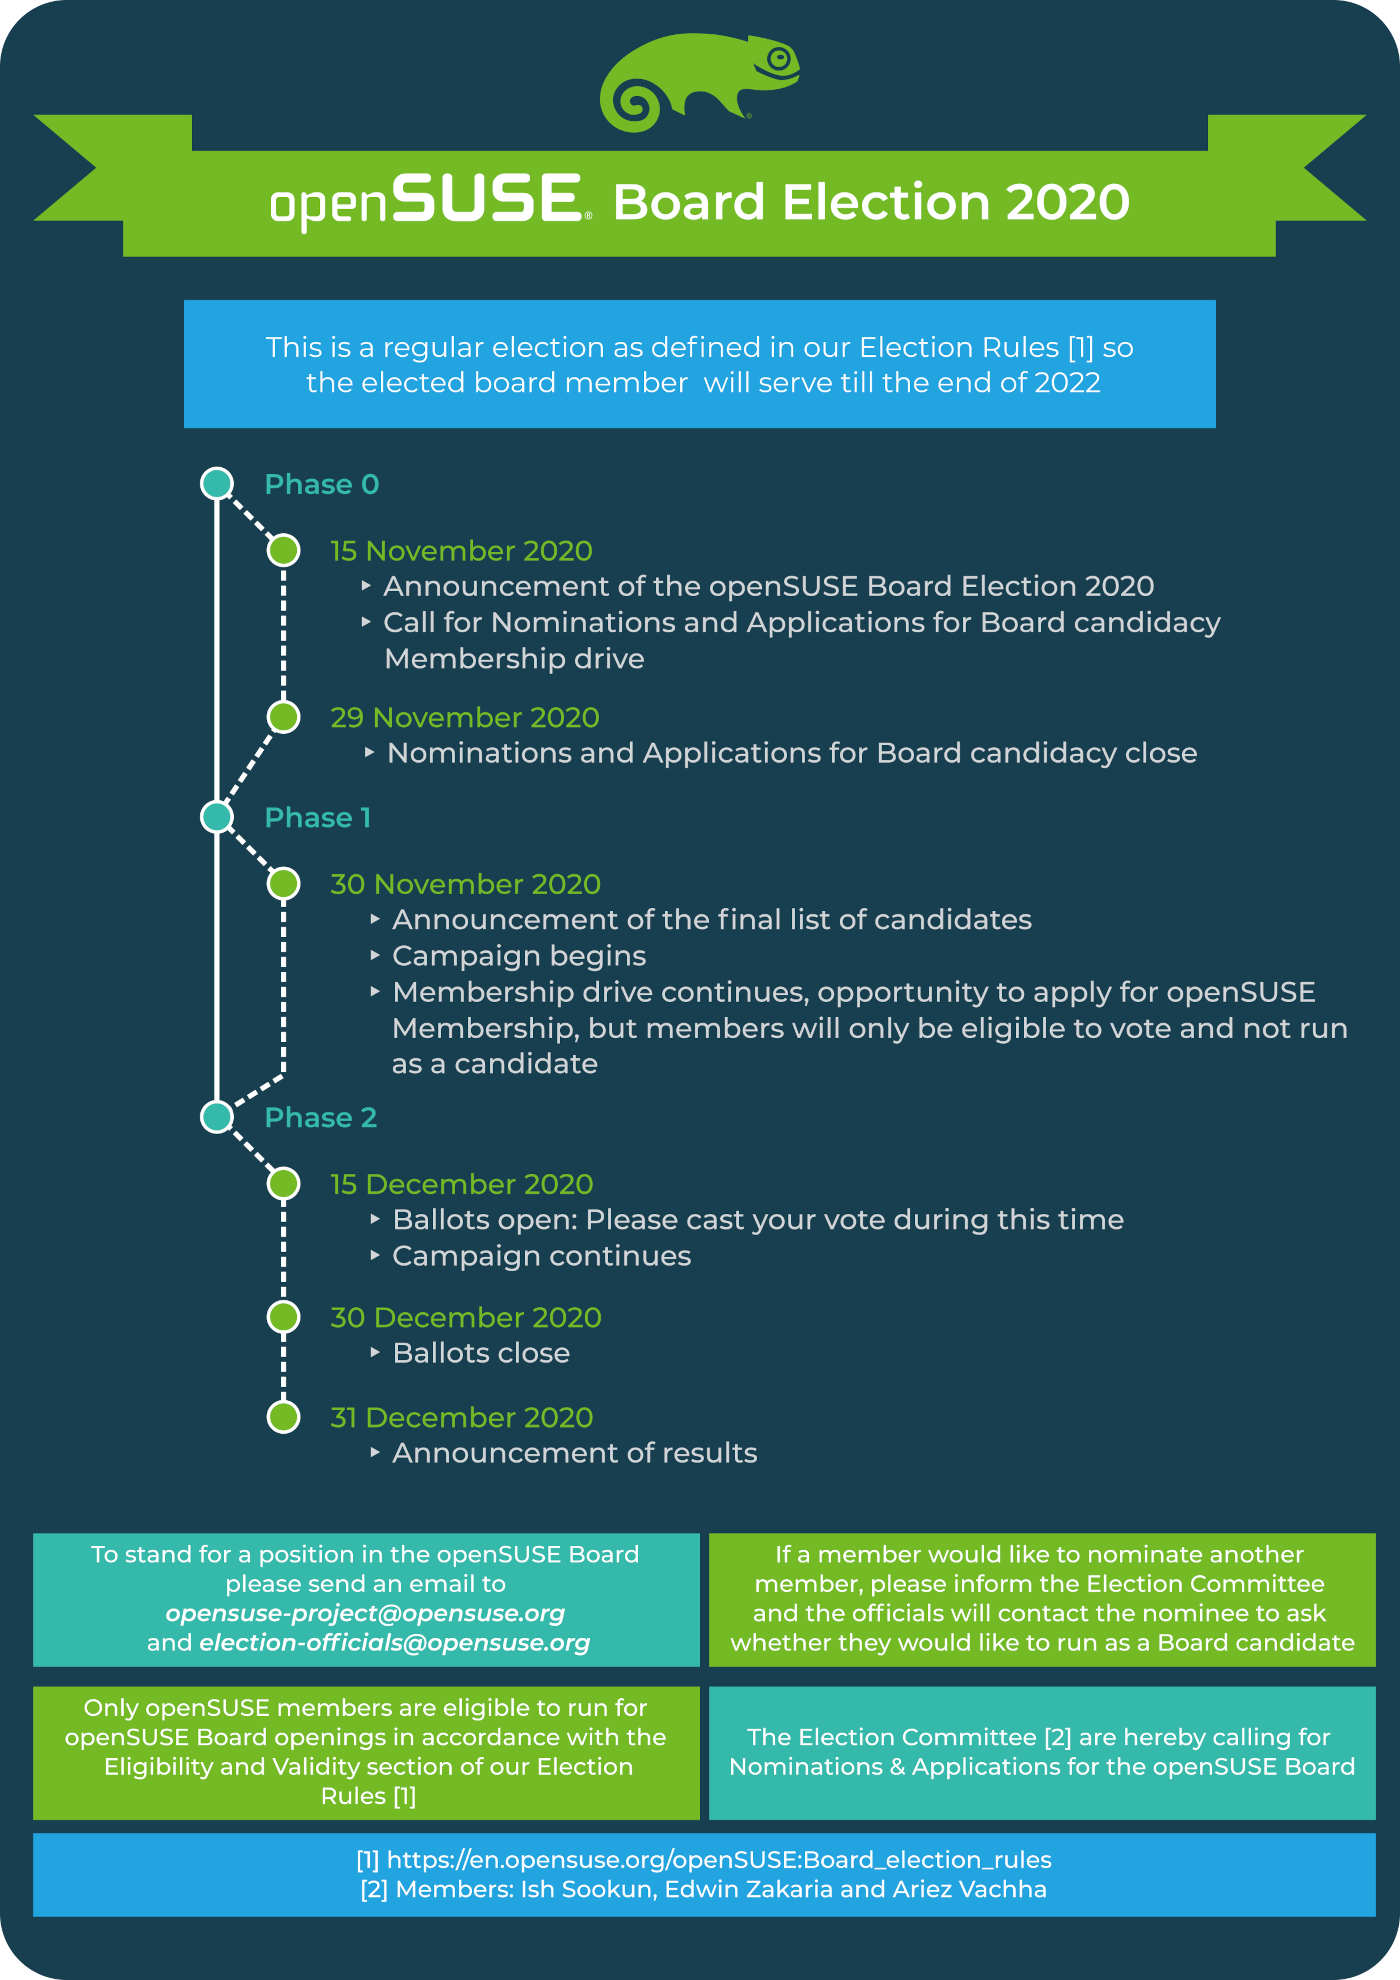 openSUSE Board Election 2020 announced